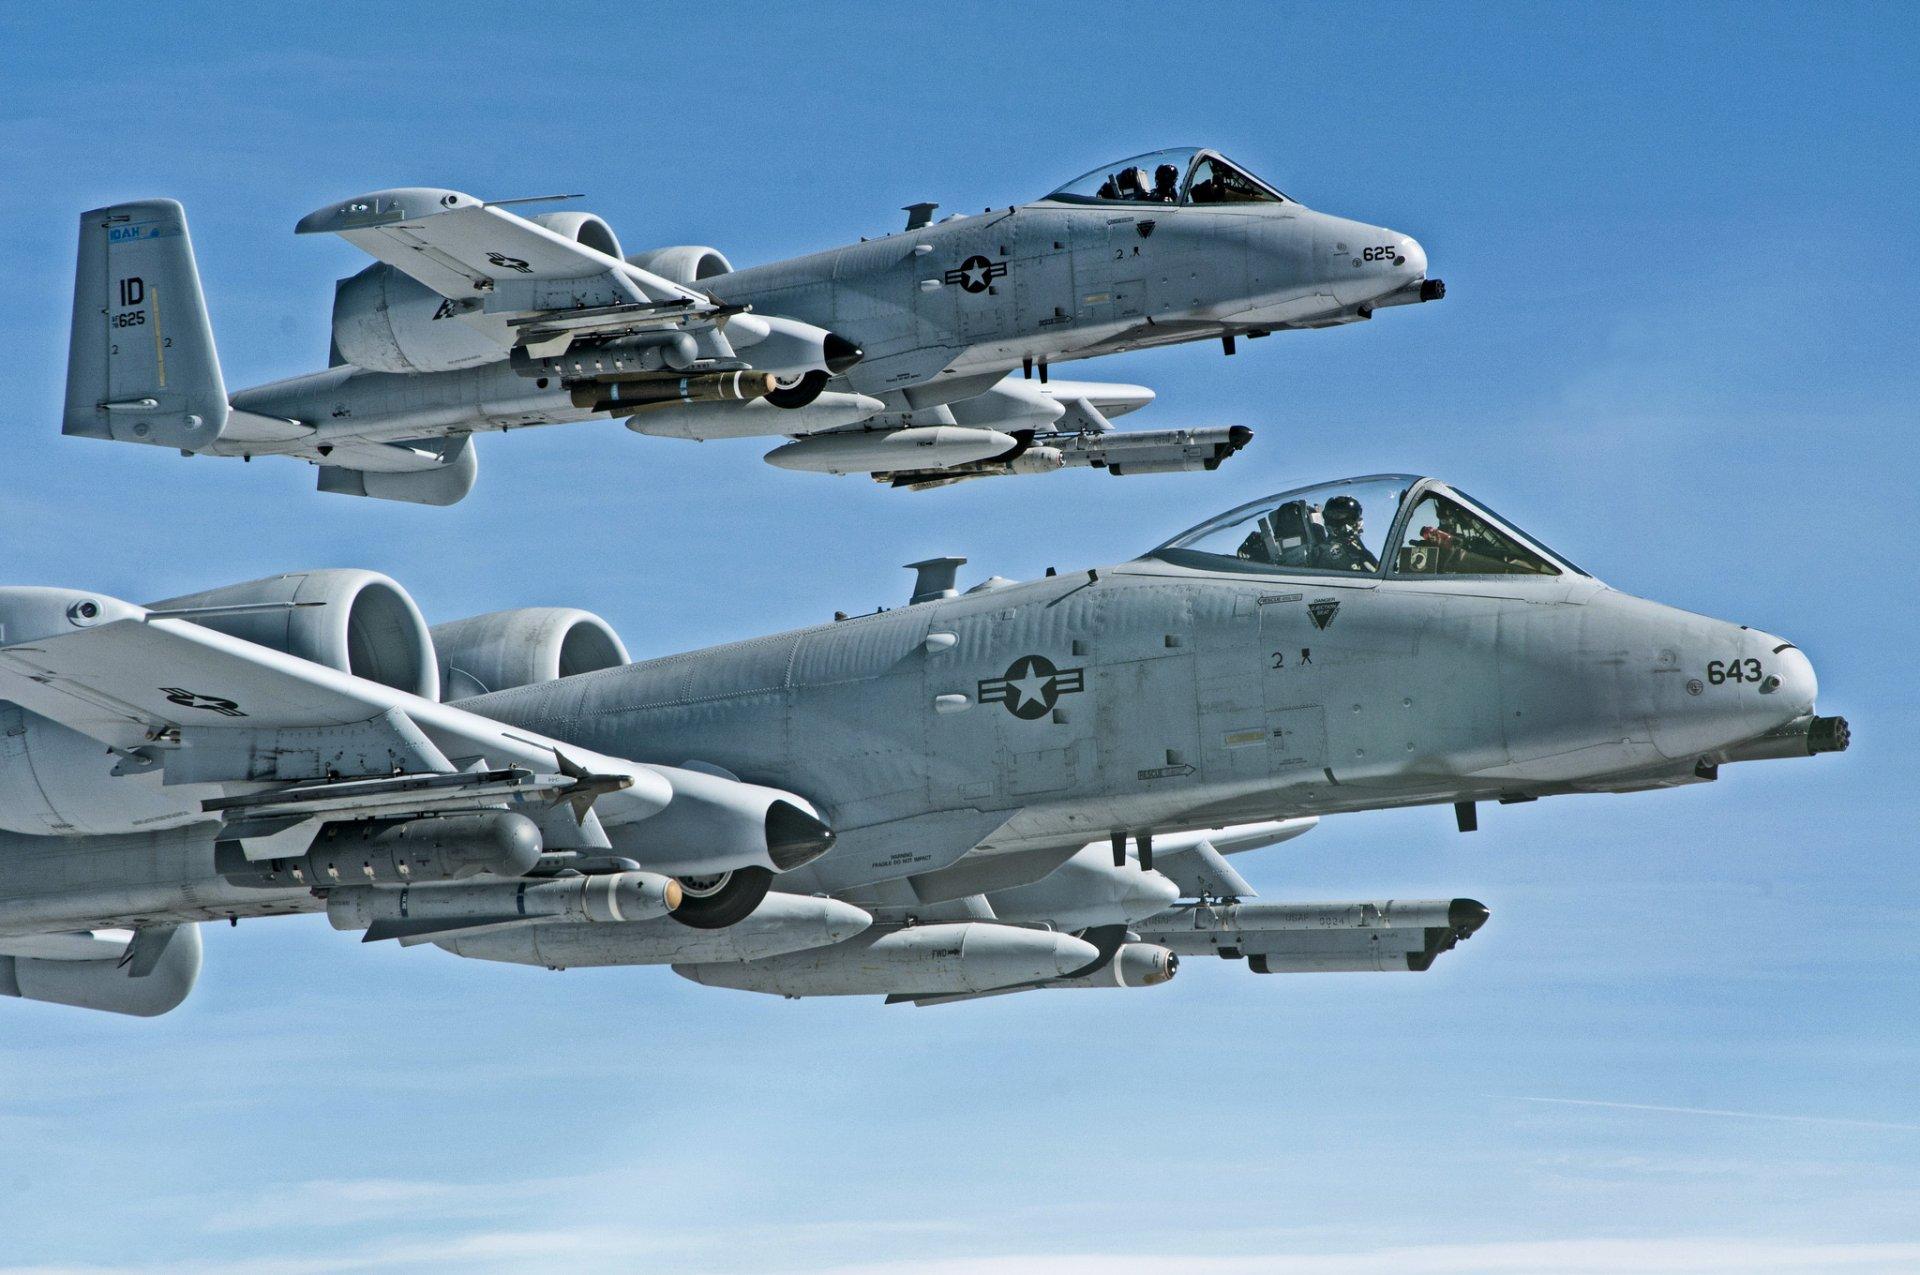 Обои «тандерболт» ii, штурмовик, thunderbolt ii, A-10, Схема. Авиация foto 11